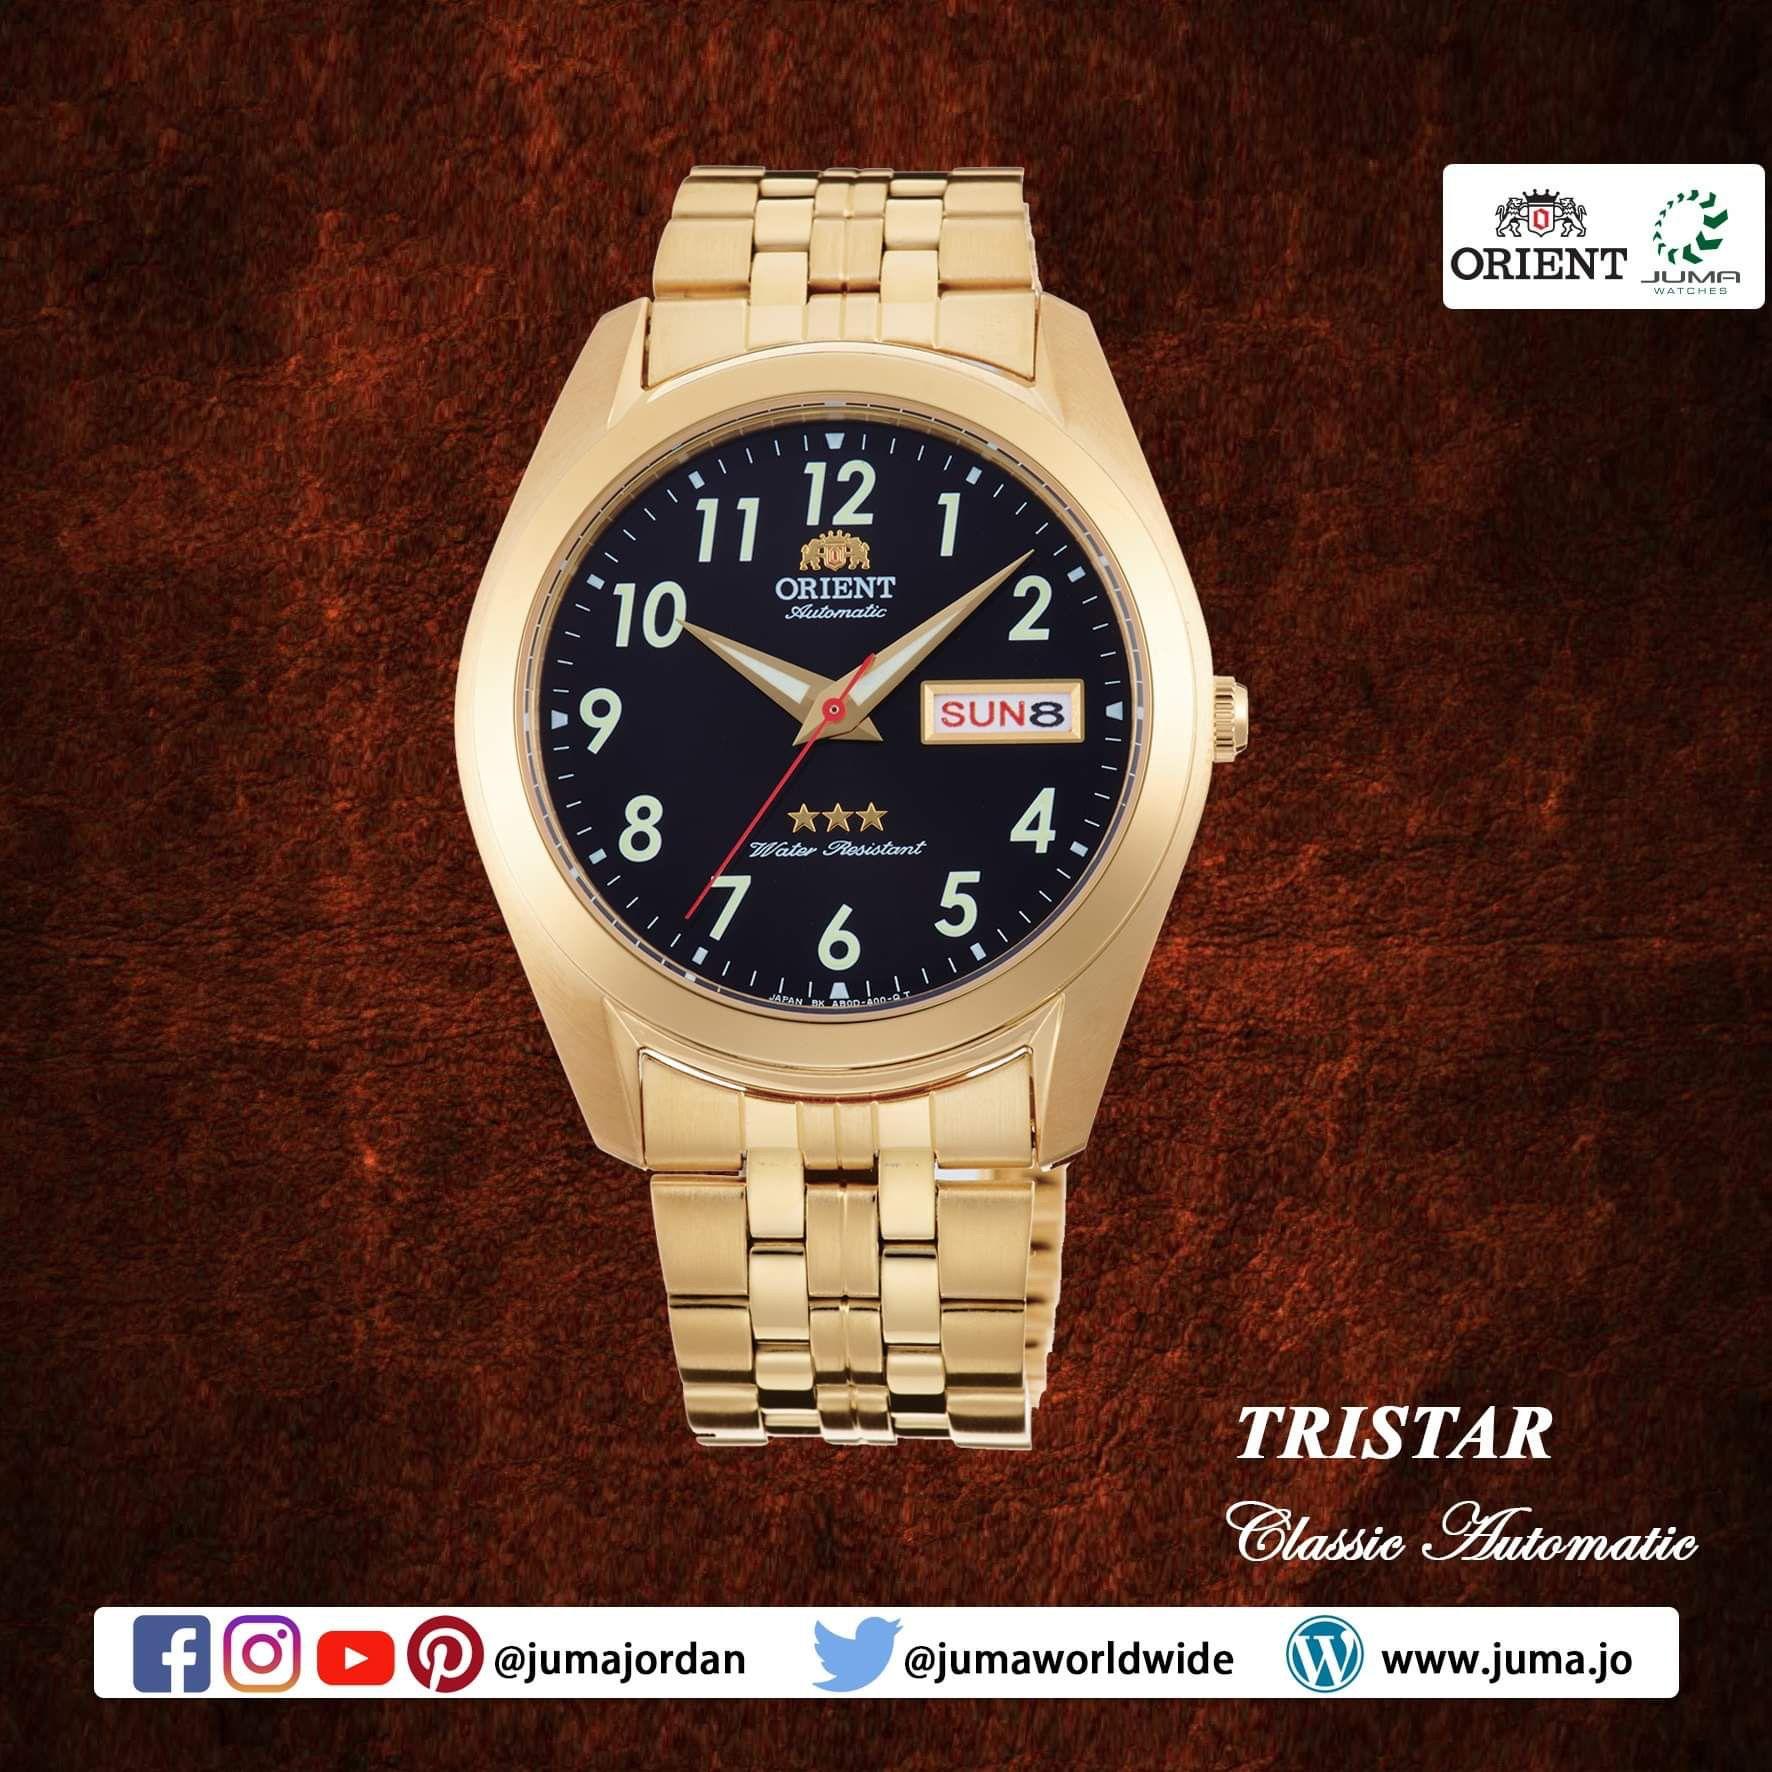 Orient Tristar Mechanical Watch Metal Strap Strap 39 0mm Case Metal Straps Orient Watch Watches For Men